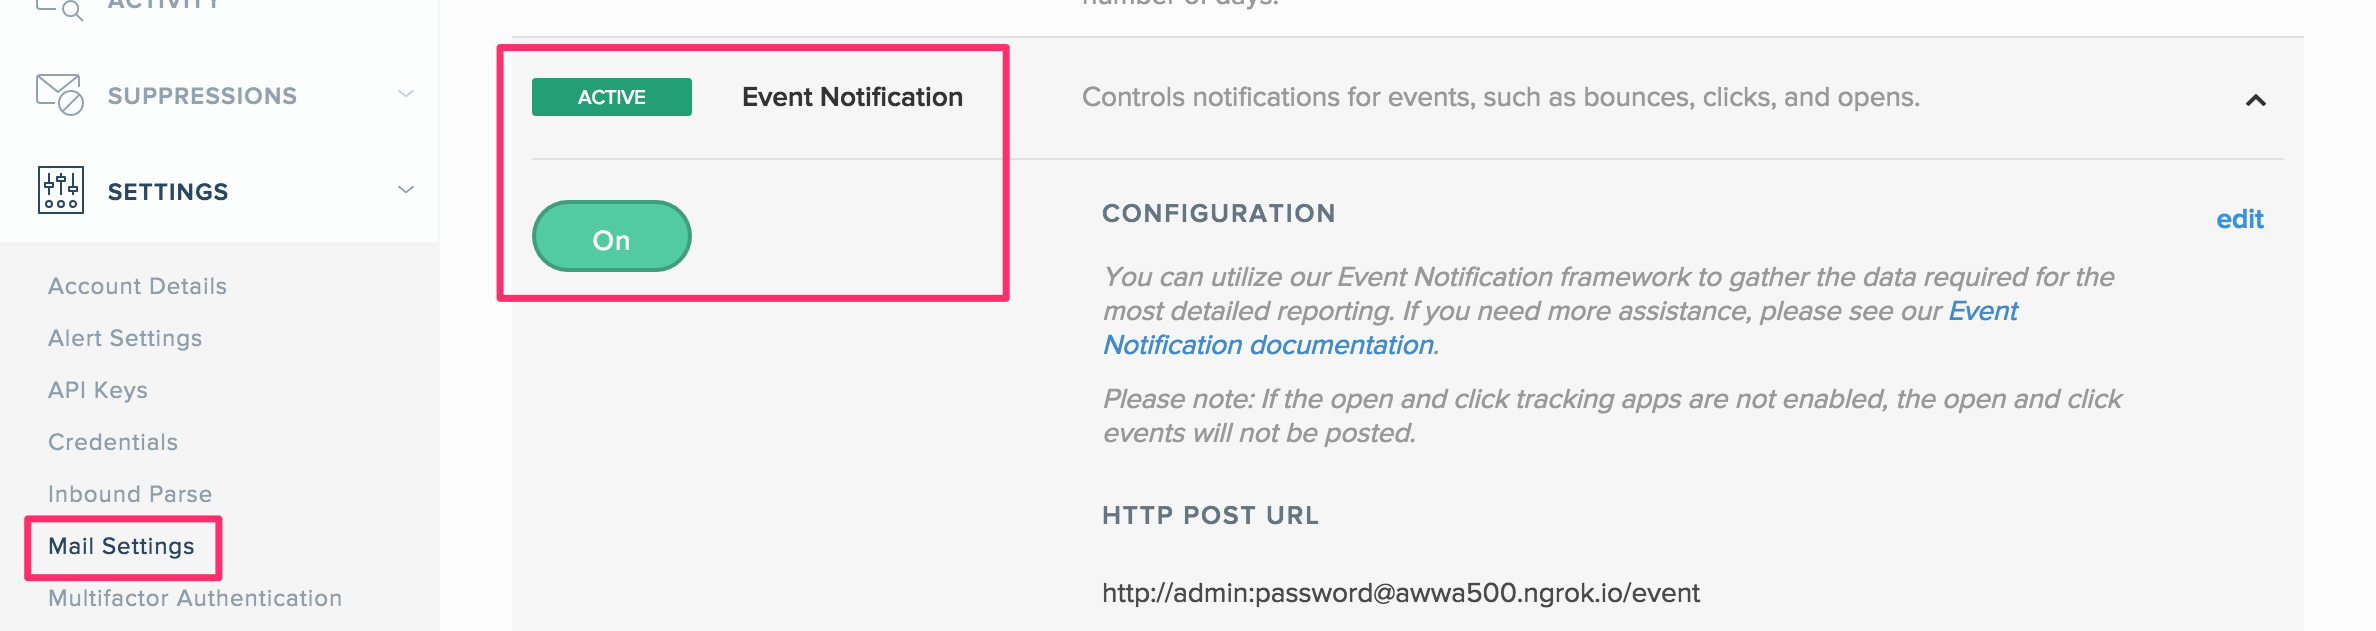 Event Notificationの有効化